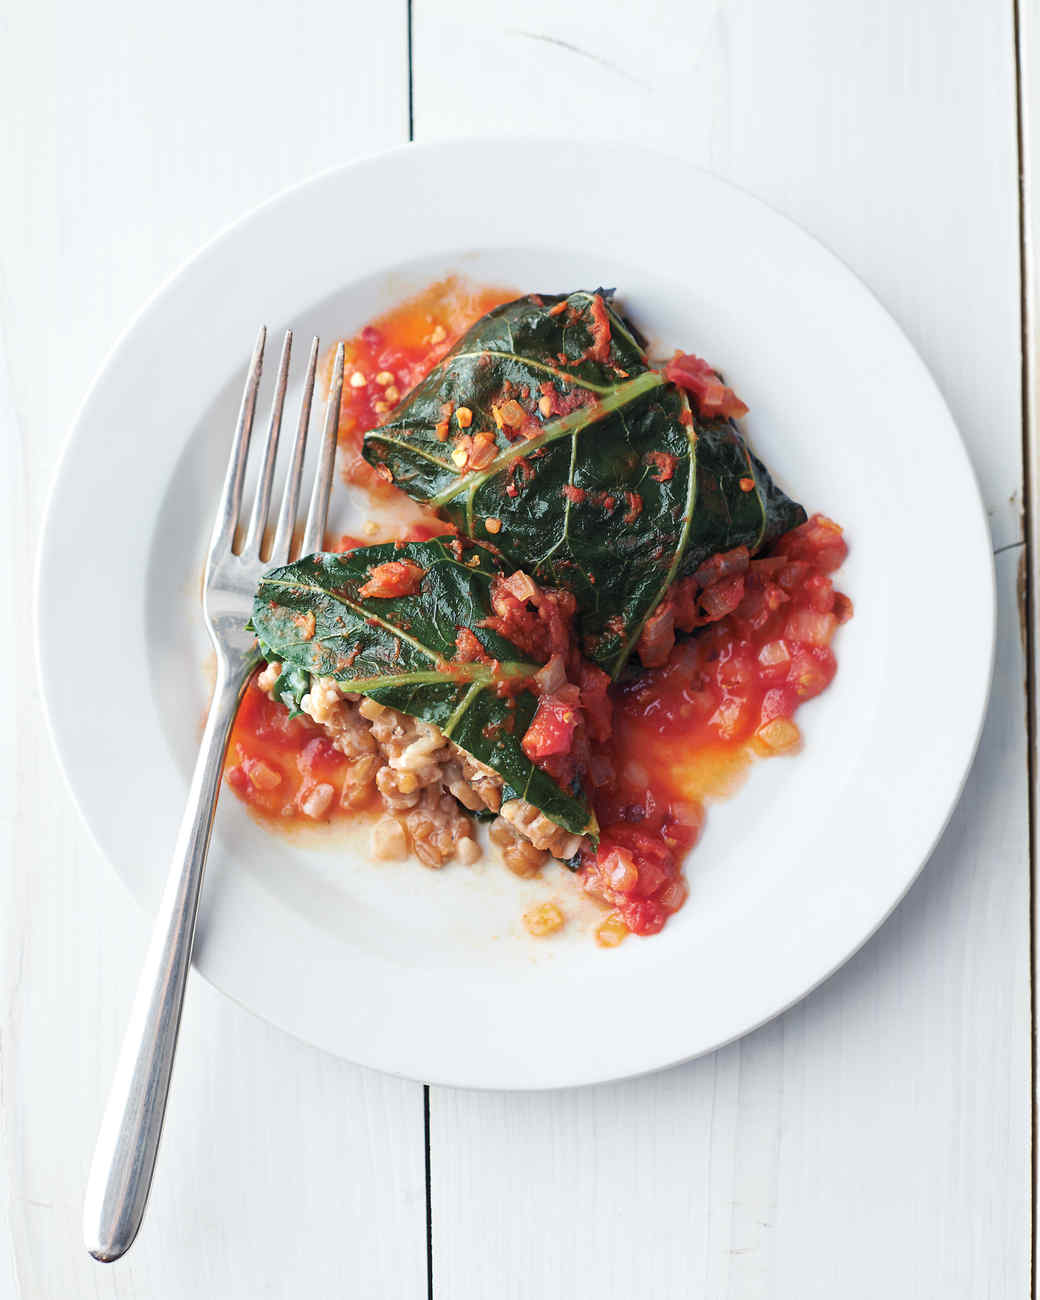 Collard green recipes easy